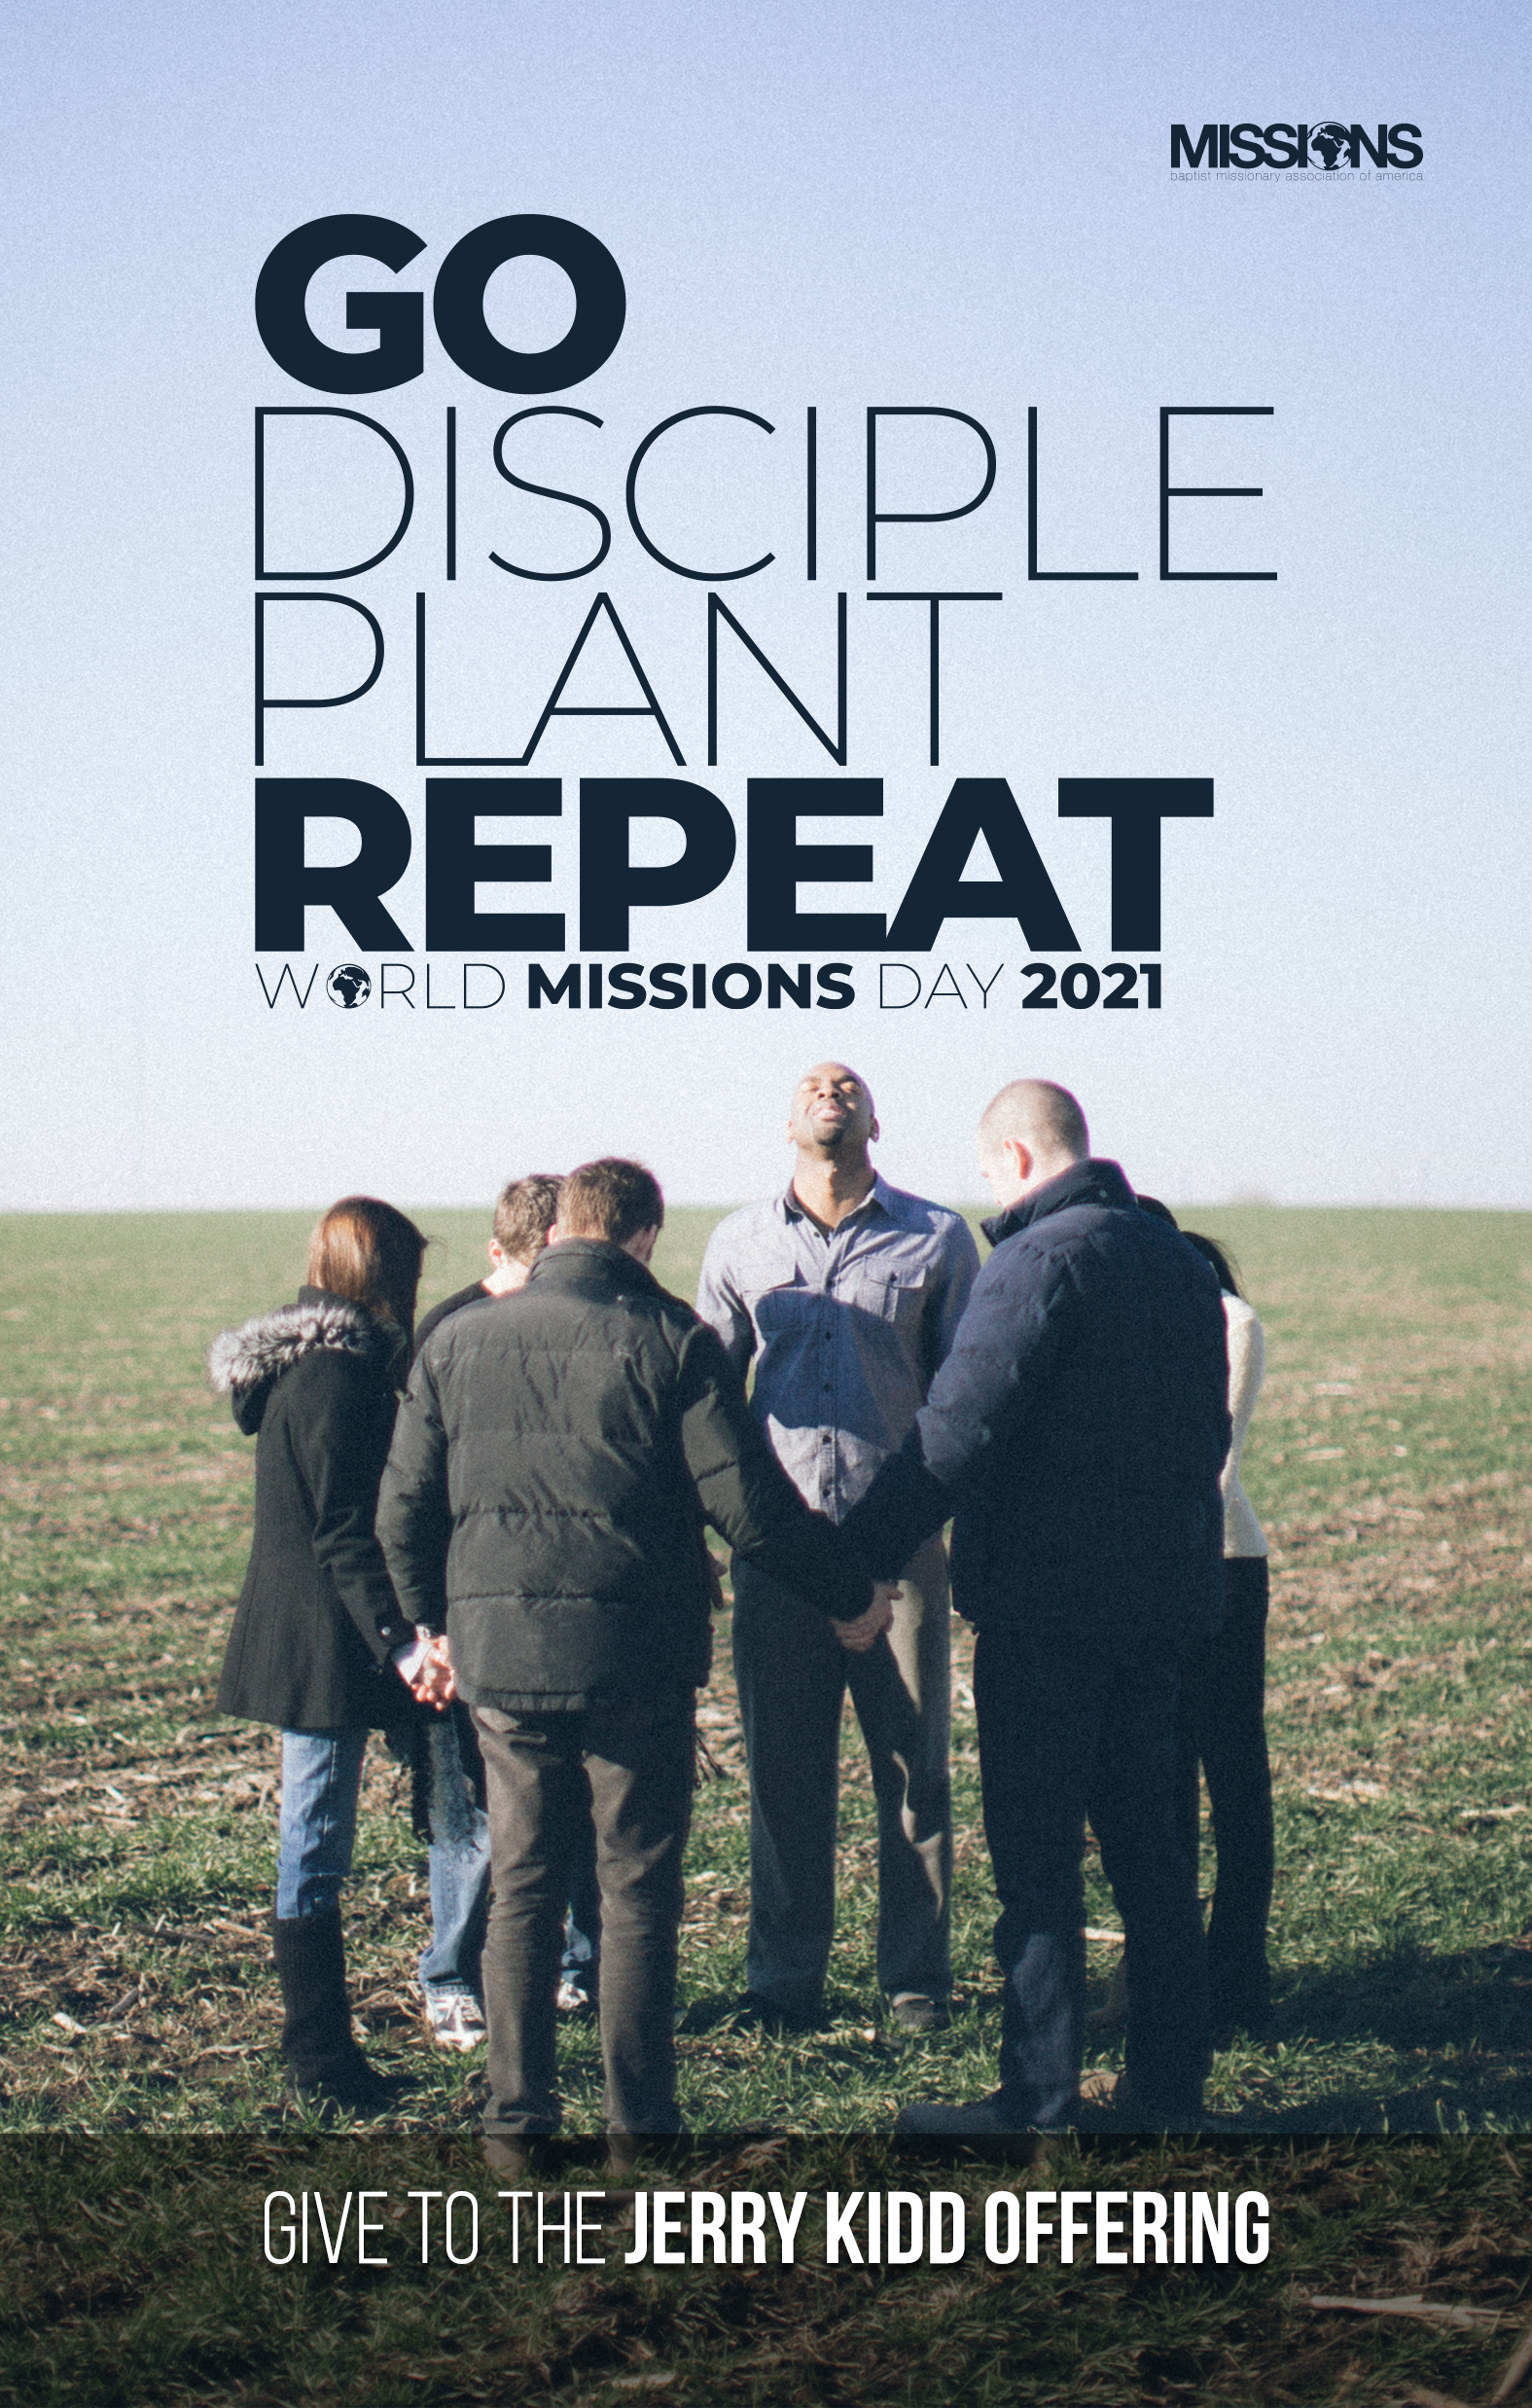 Go Disciple Plant Repeat 2021